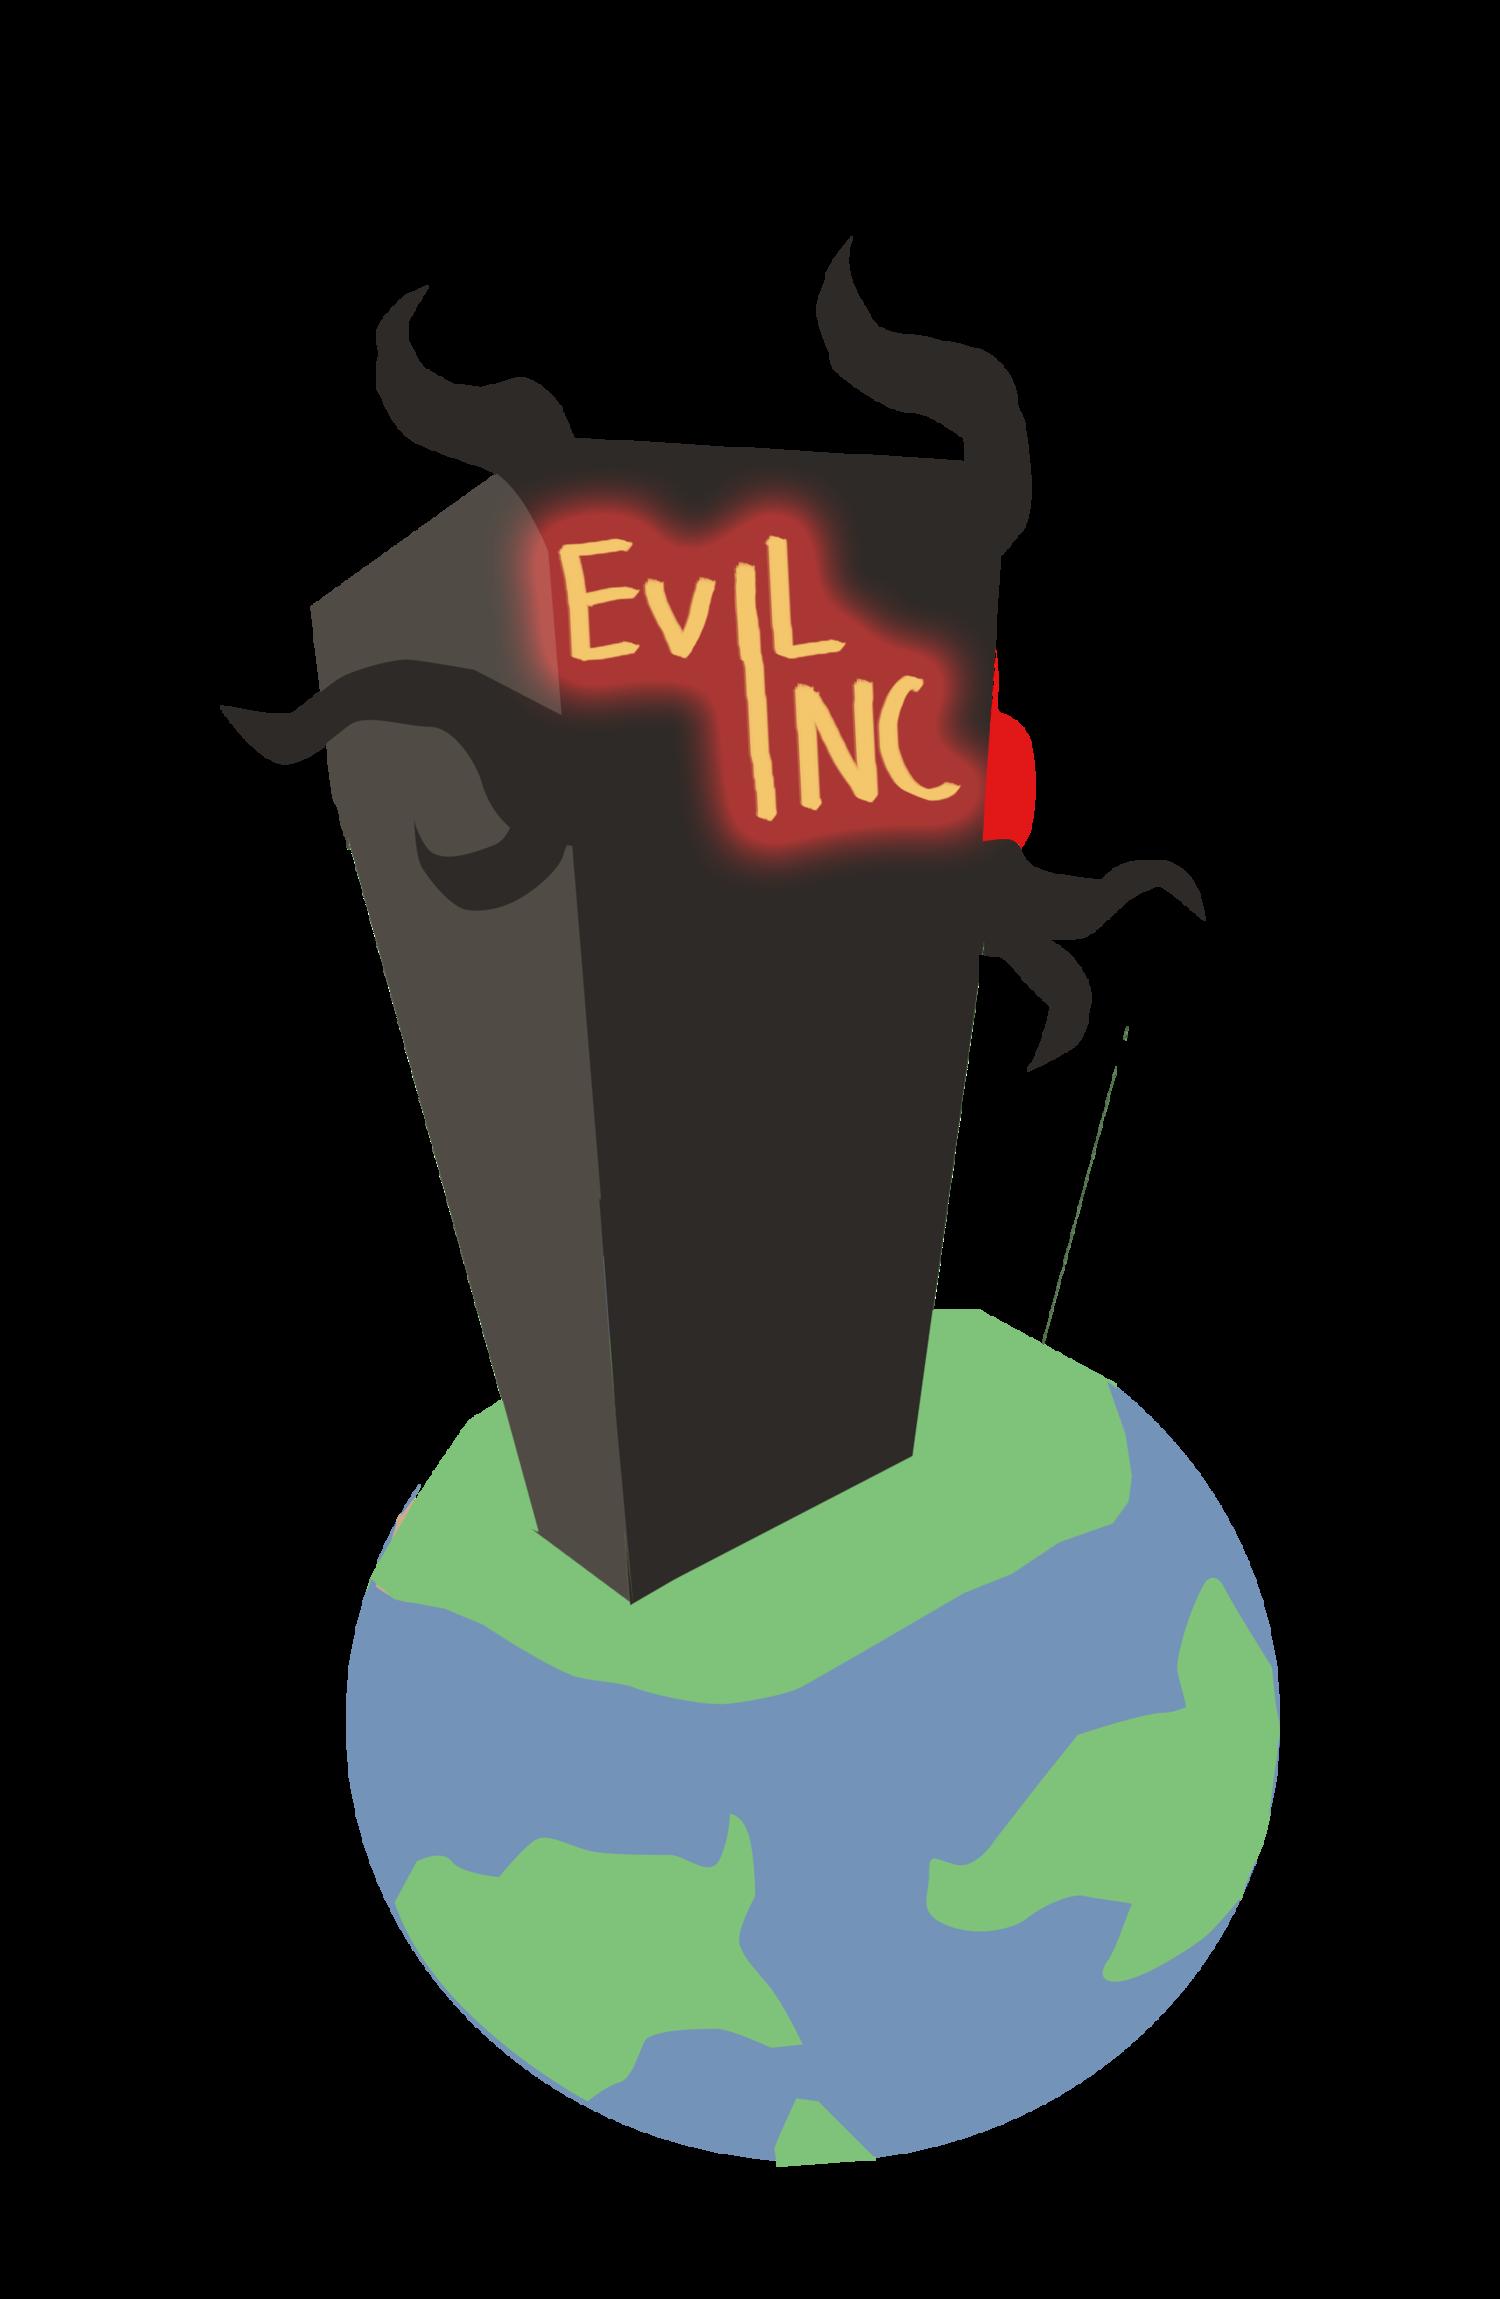 Evil Inc.